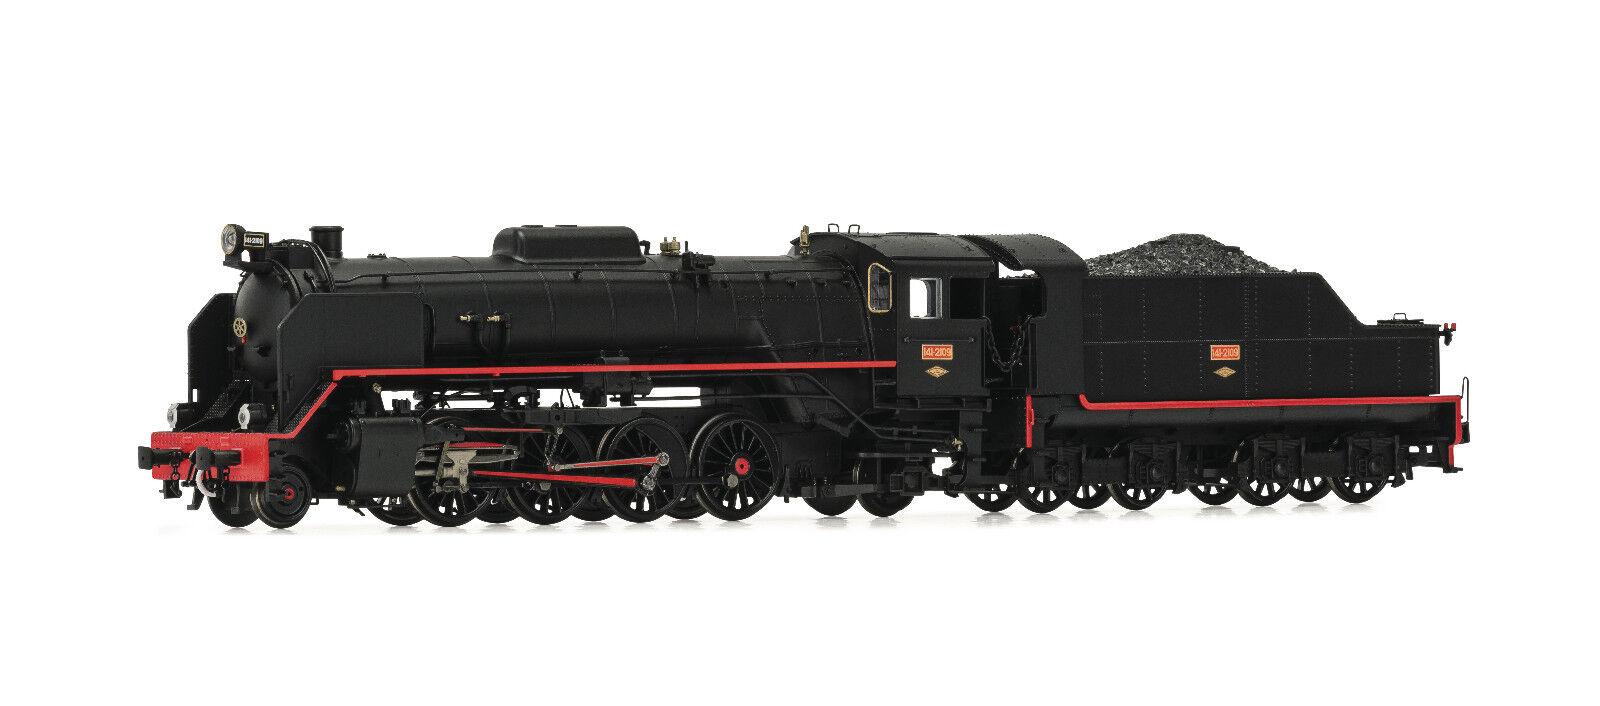 Plancha eléctrica e4156 dampflokomotive Renfe mikado 141 - 2109 ep.iii